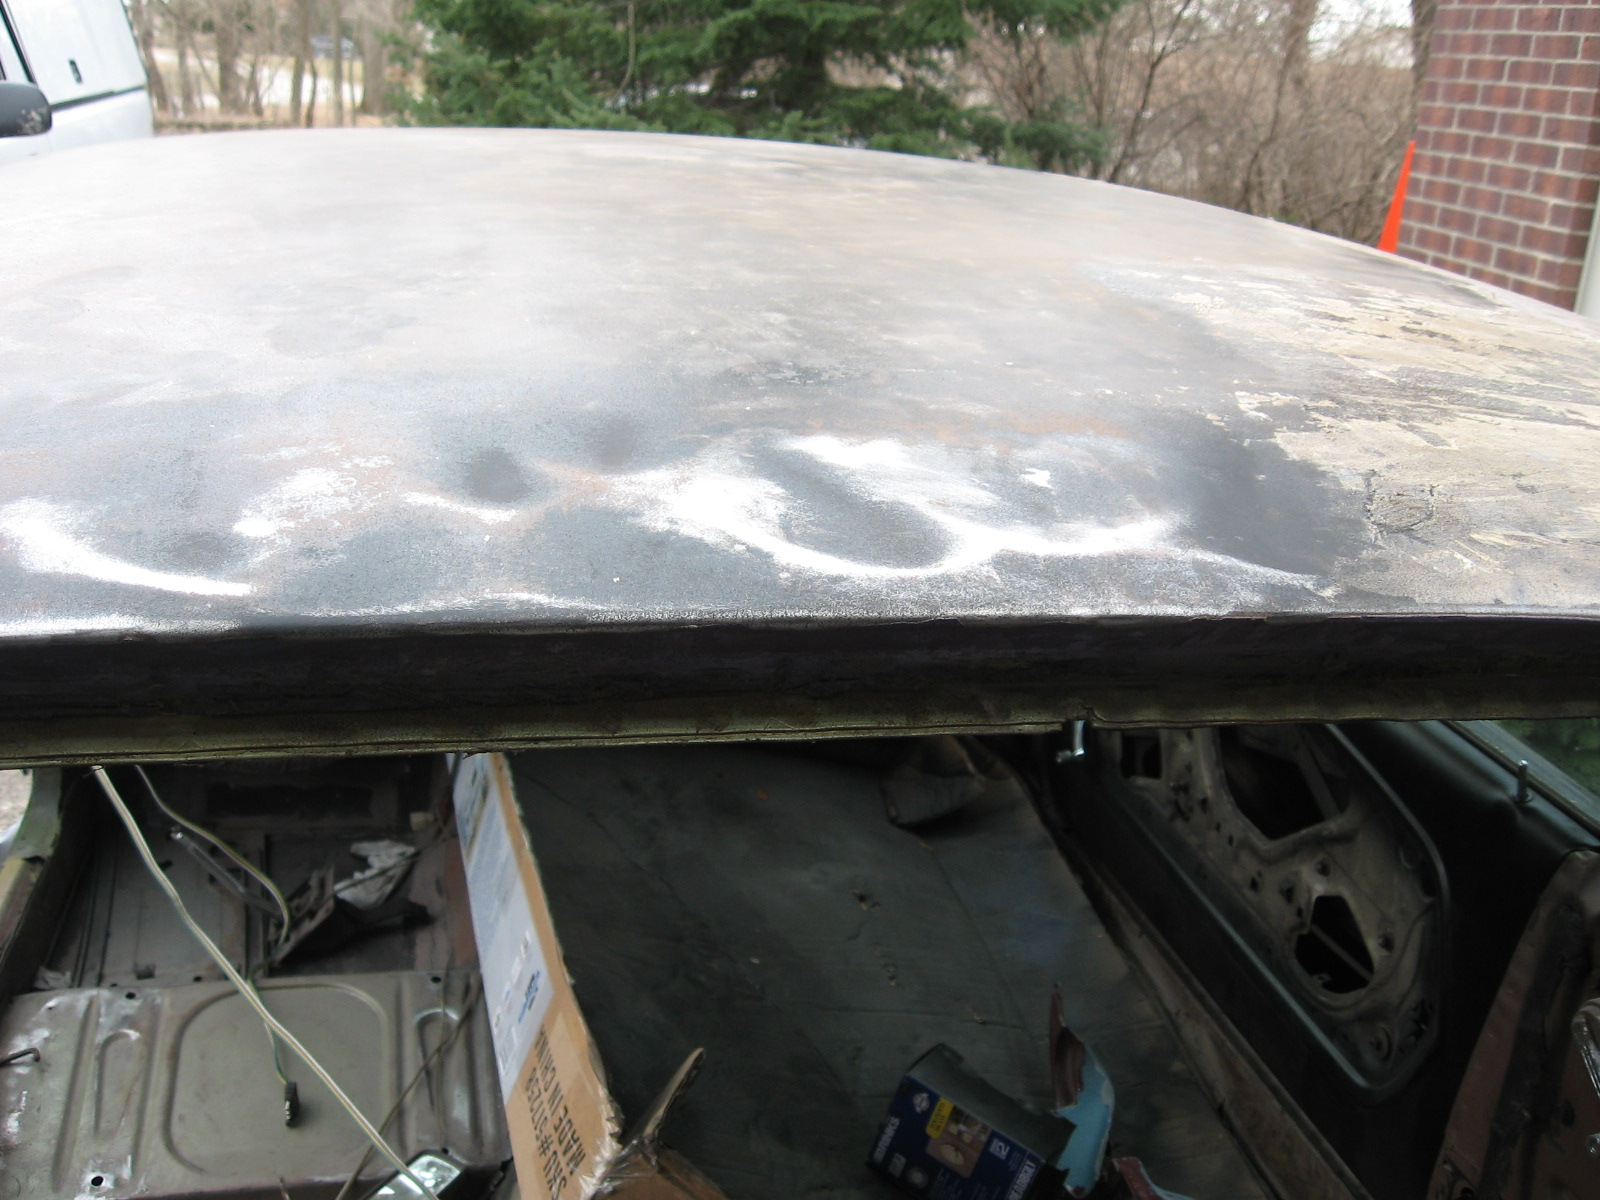 1967 Mustang Restoration Preparing The Roof Paint Rust